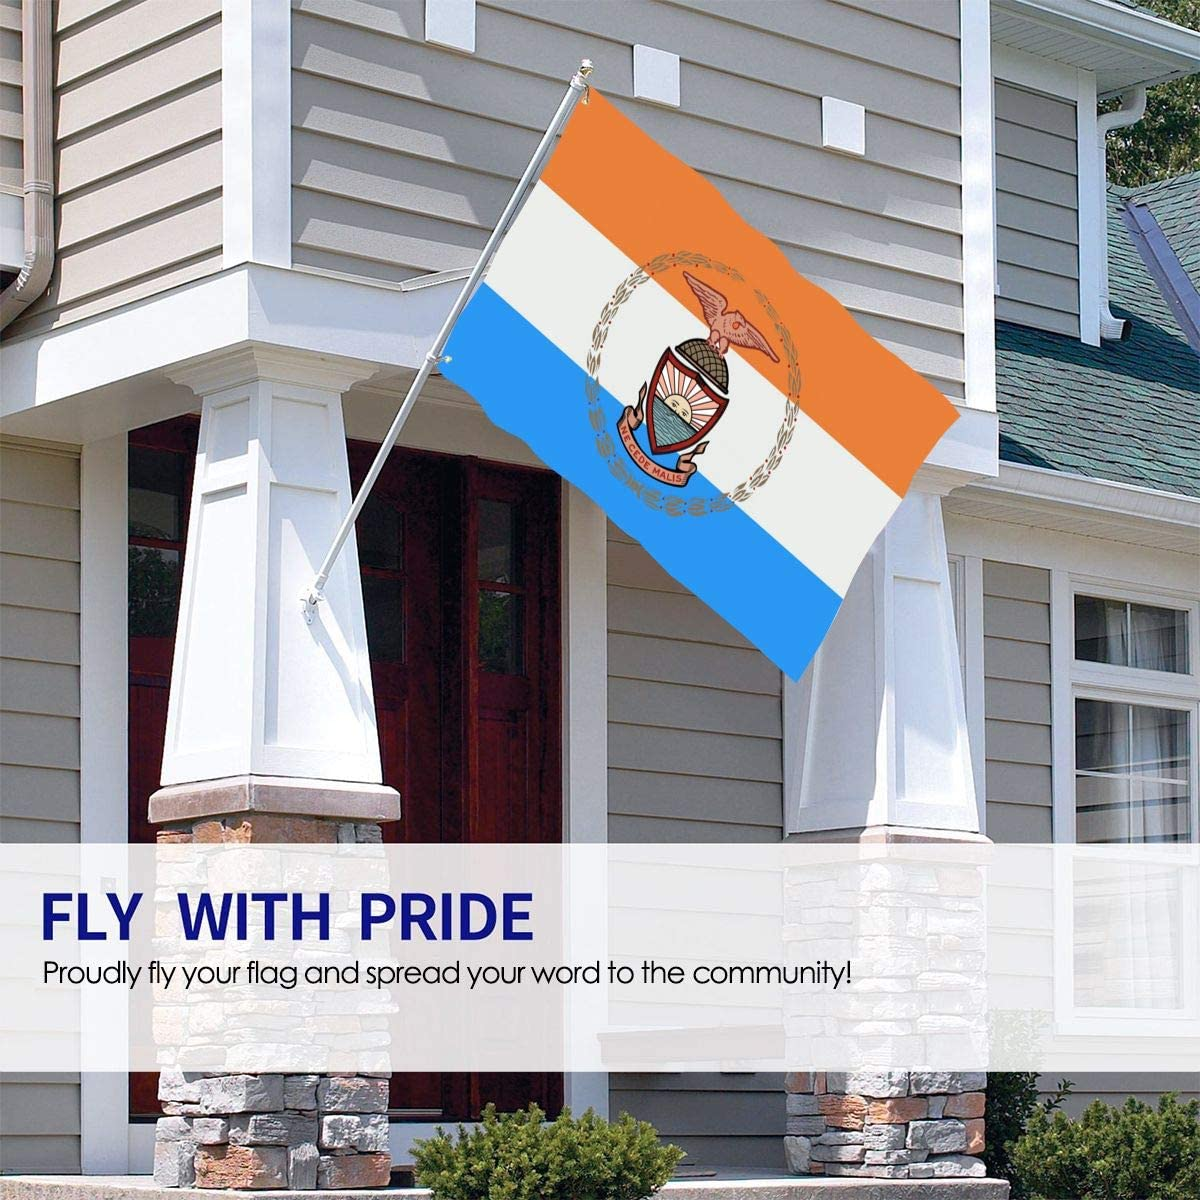 Apedes Lincoln County Maine Garage Hangar Basement Flag 2x3 Feet